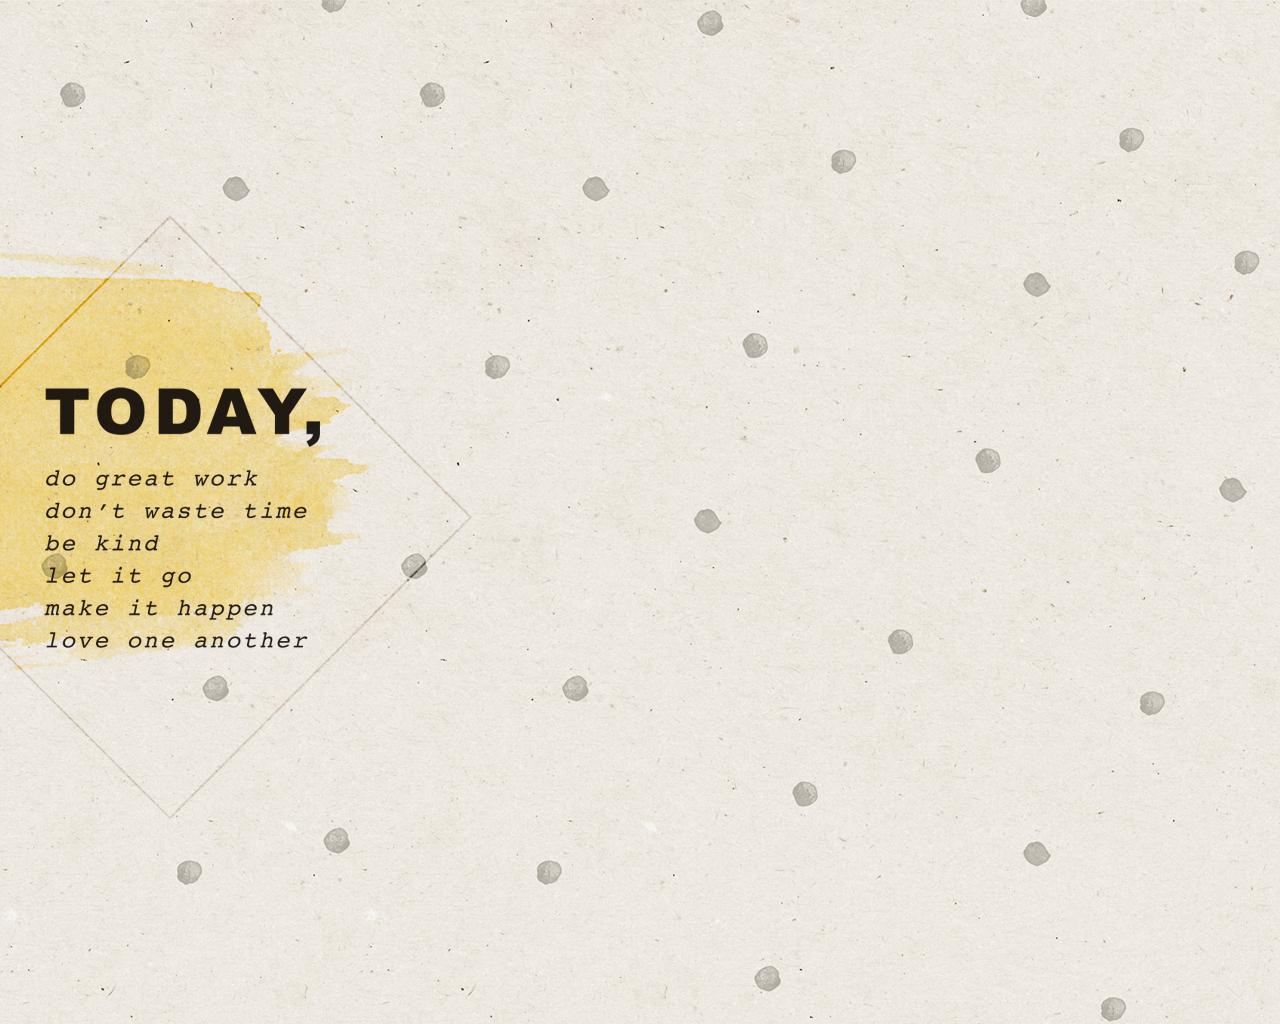 desktop wallpaper tumblr,text,font,yellow,line,pattern